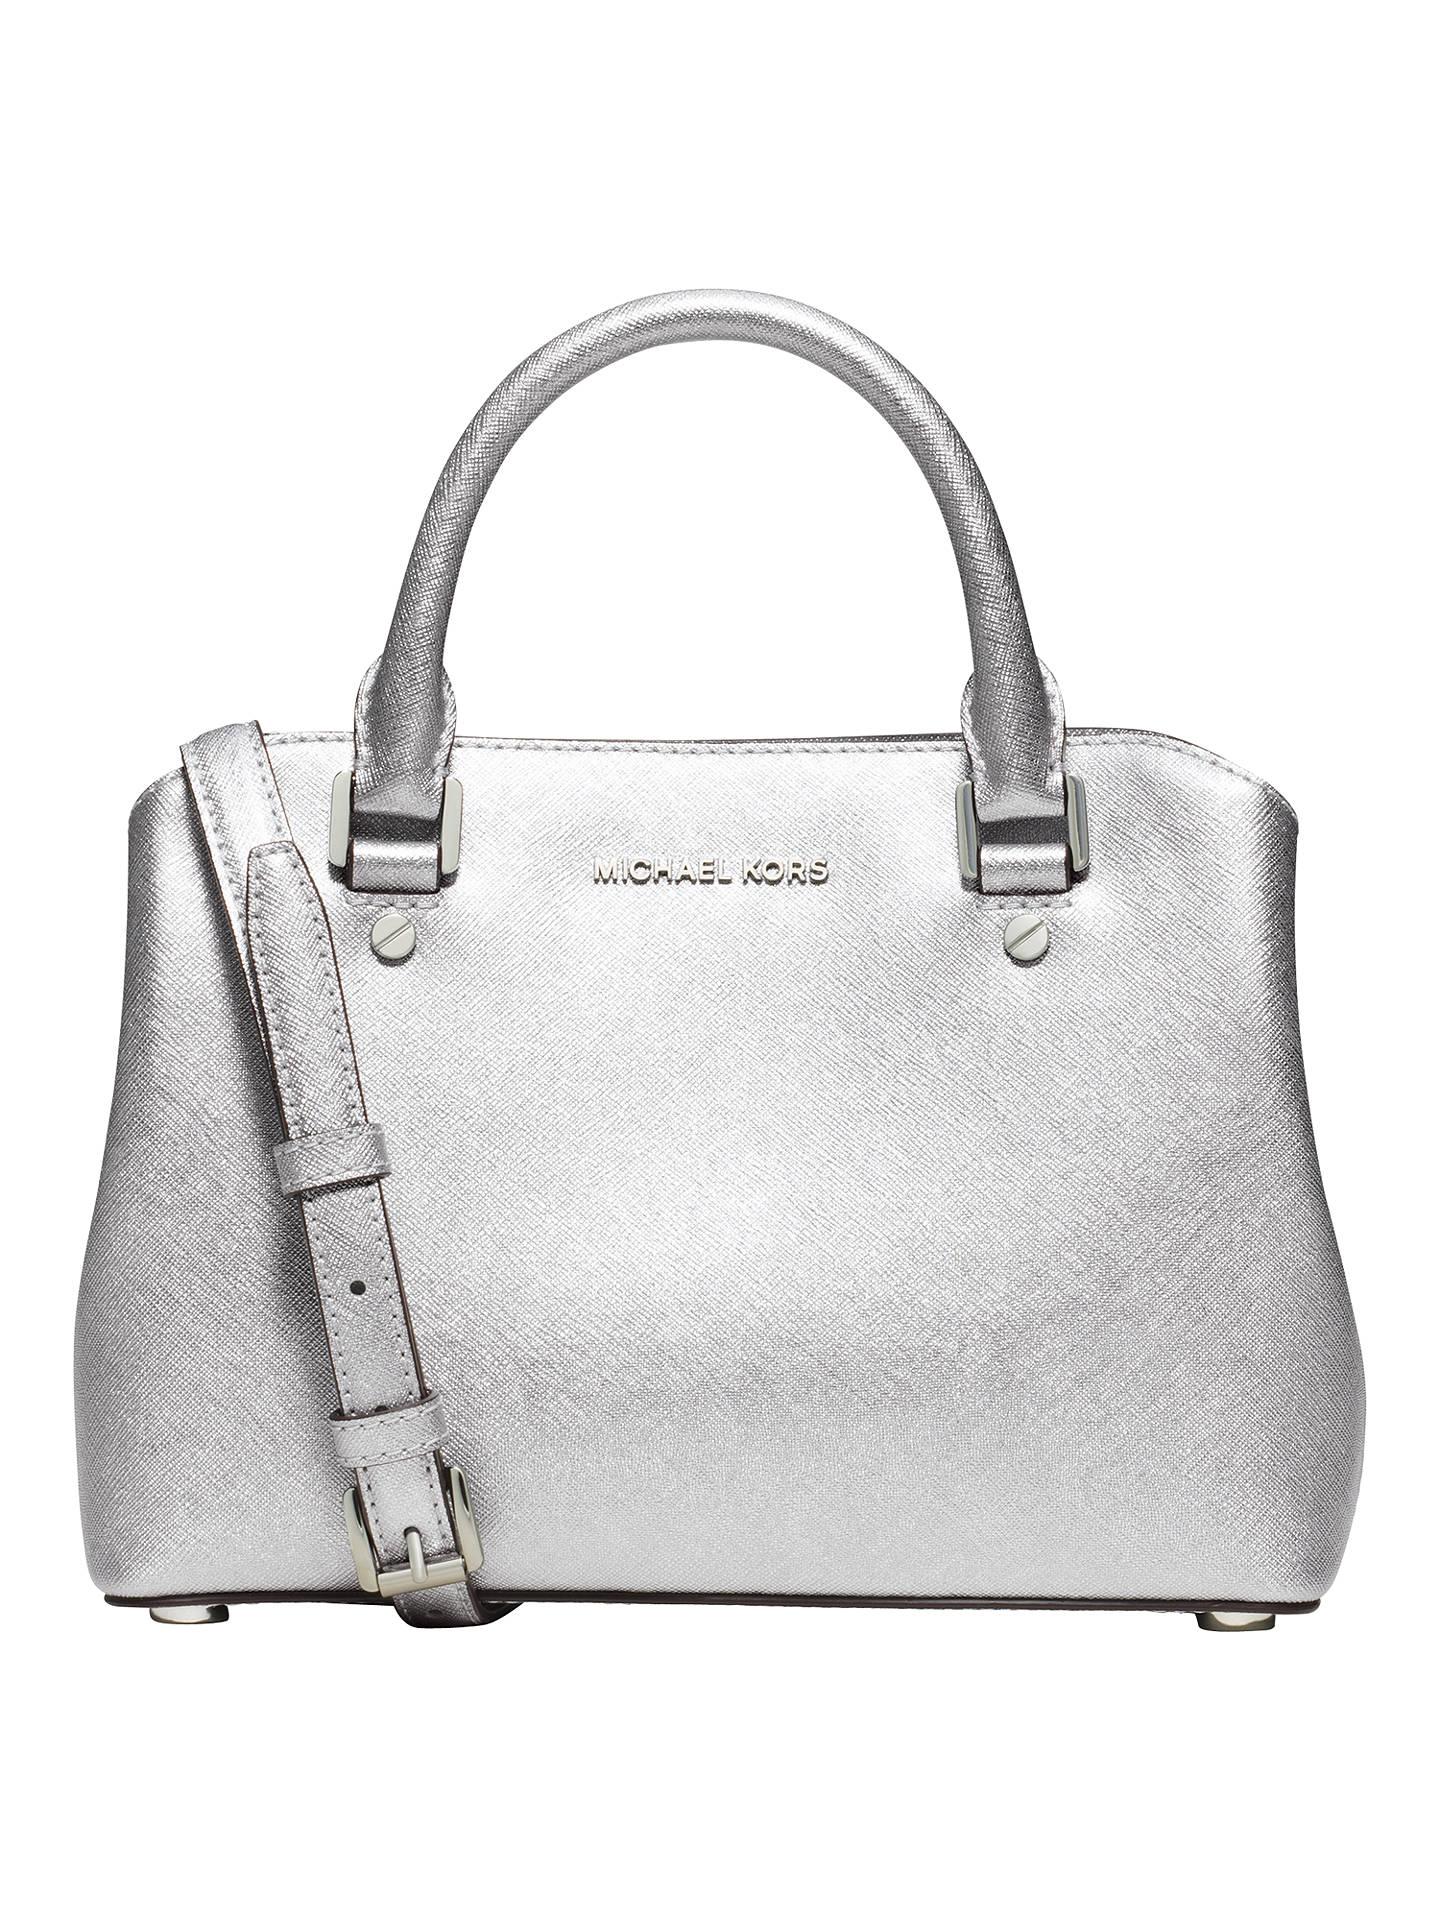 42502cfe612c Buy MICHAEL Michael Kors Savannah Small Leather Satchel, Silver Online at  johnlewis.com ...